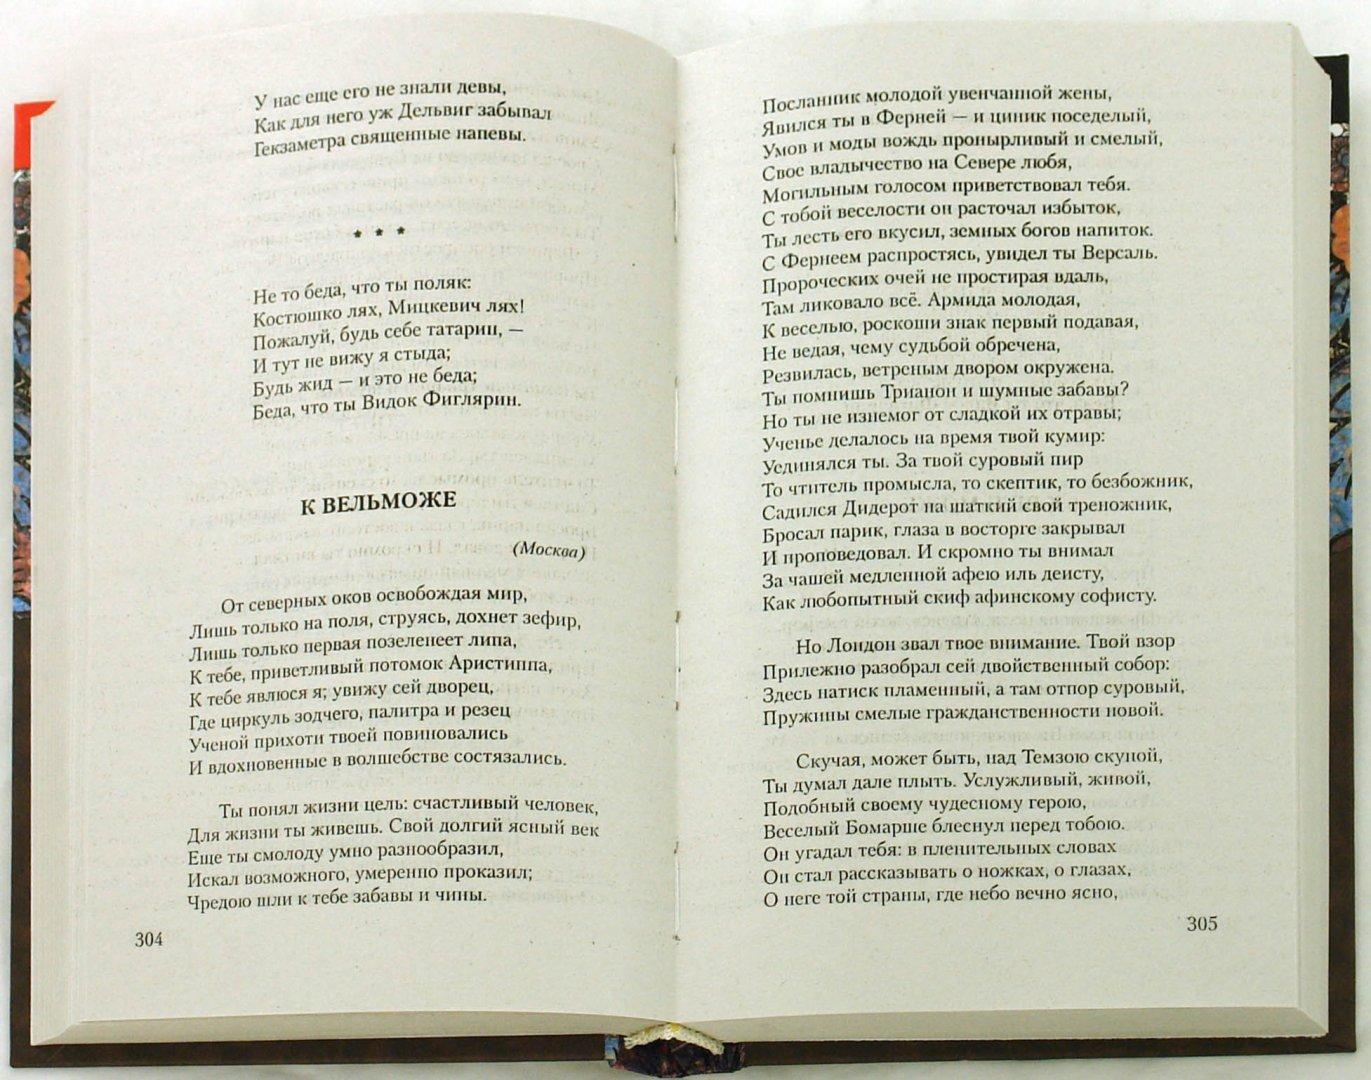 Иллюстрация 1 из 19 для Поэзия - Александр Пушкин | Лабиринт - книги. Источник: Лабиринт